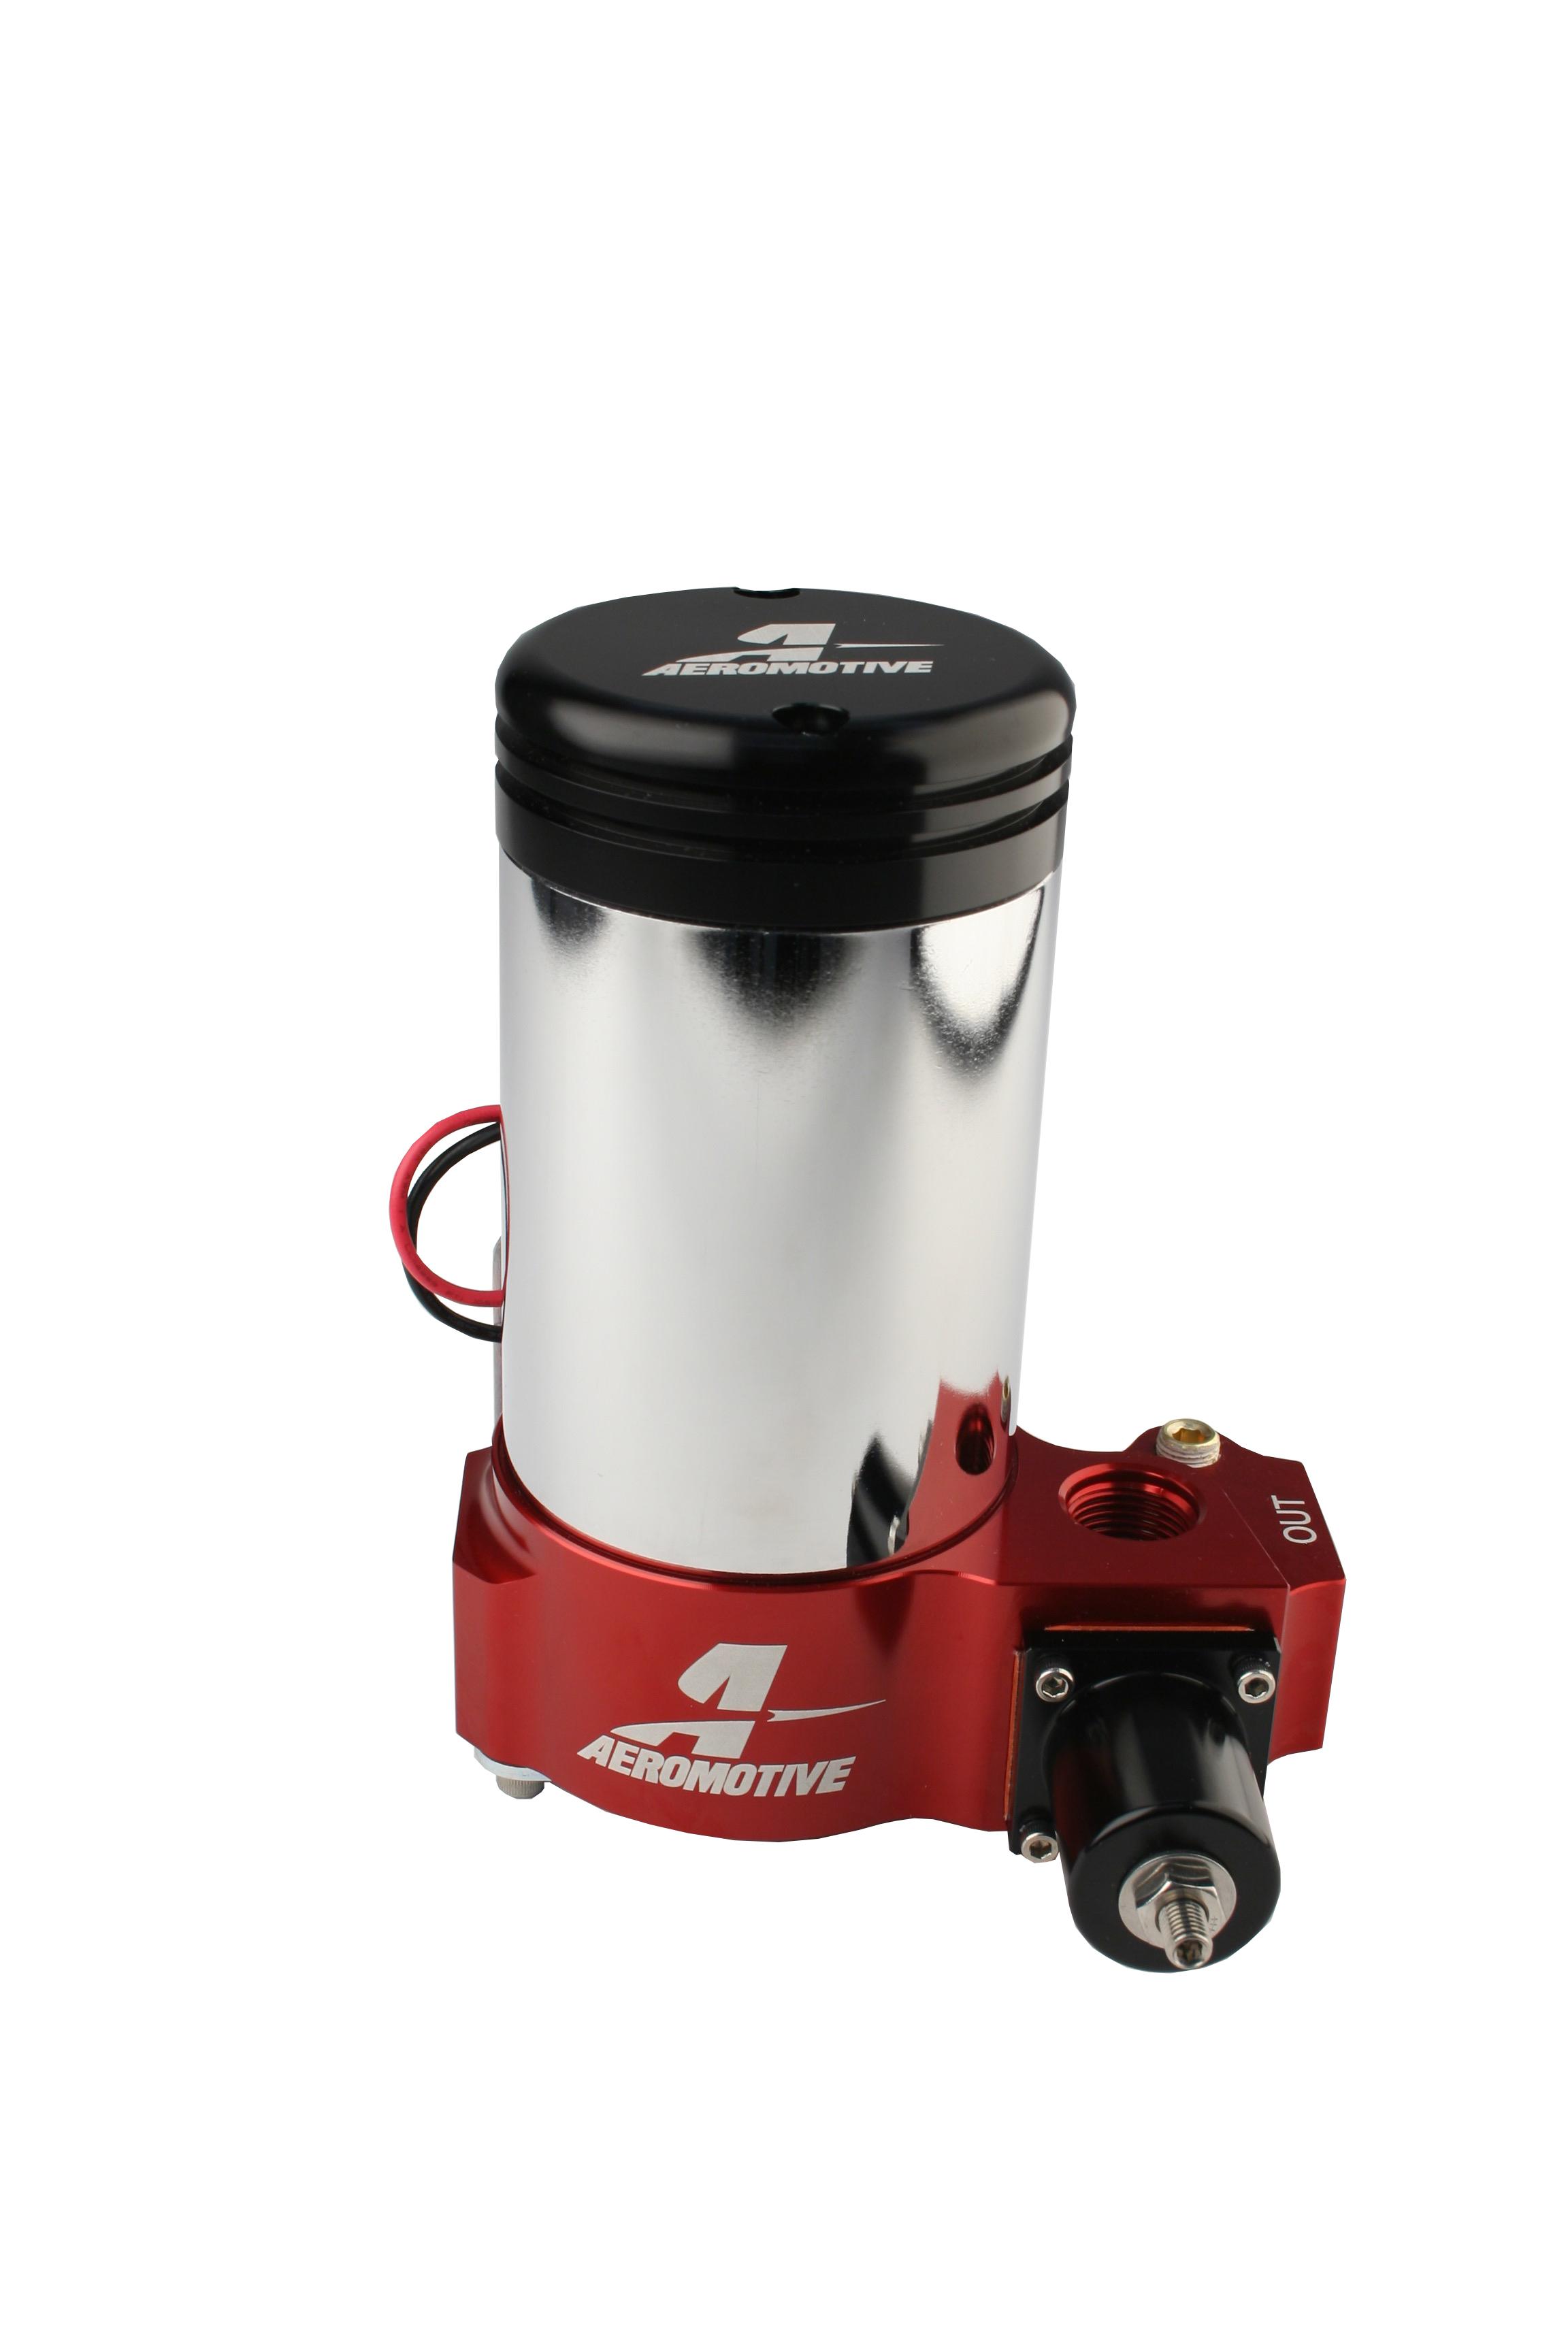 A2000 Carbureted Fuel Pump Aeromotive Inc Electric Installation Instructions